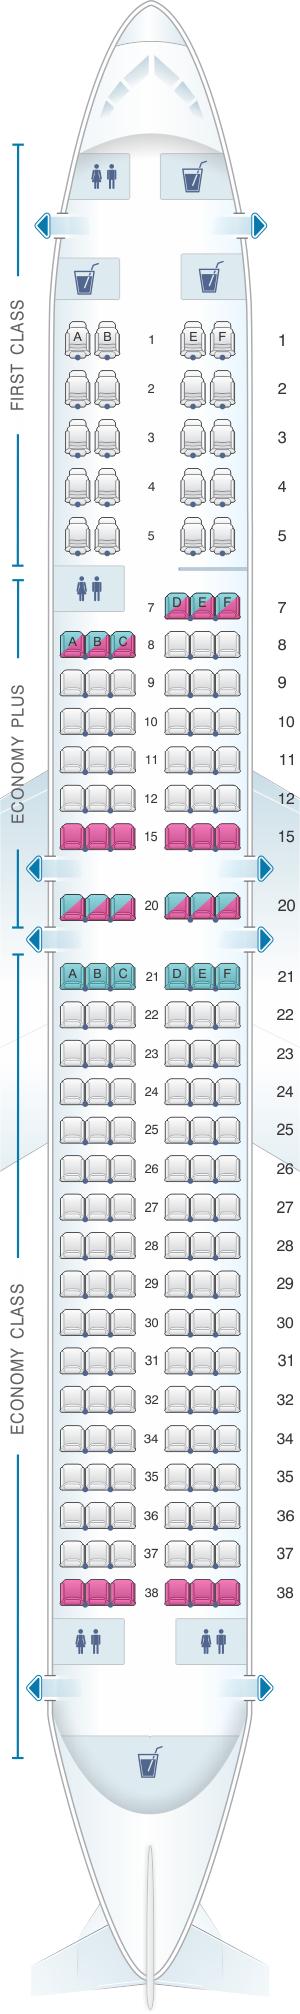 Seat Map United Airlines Boeing B737 900 Version 1 Seatmaestro